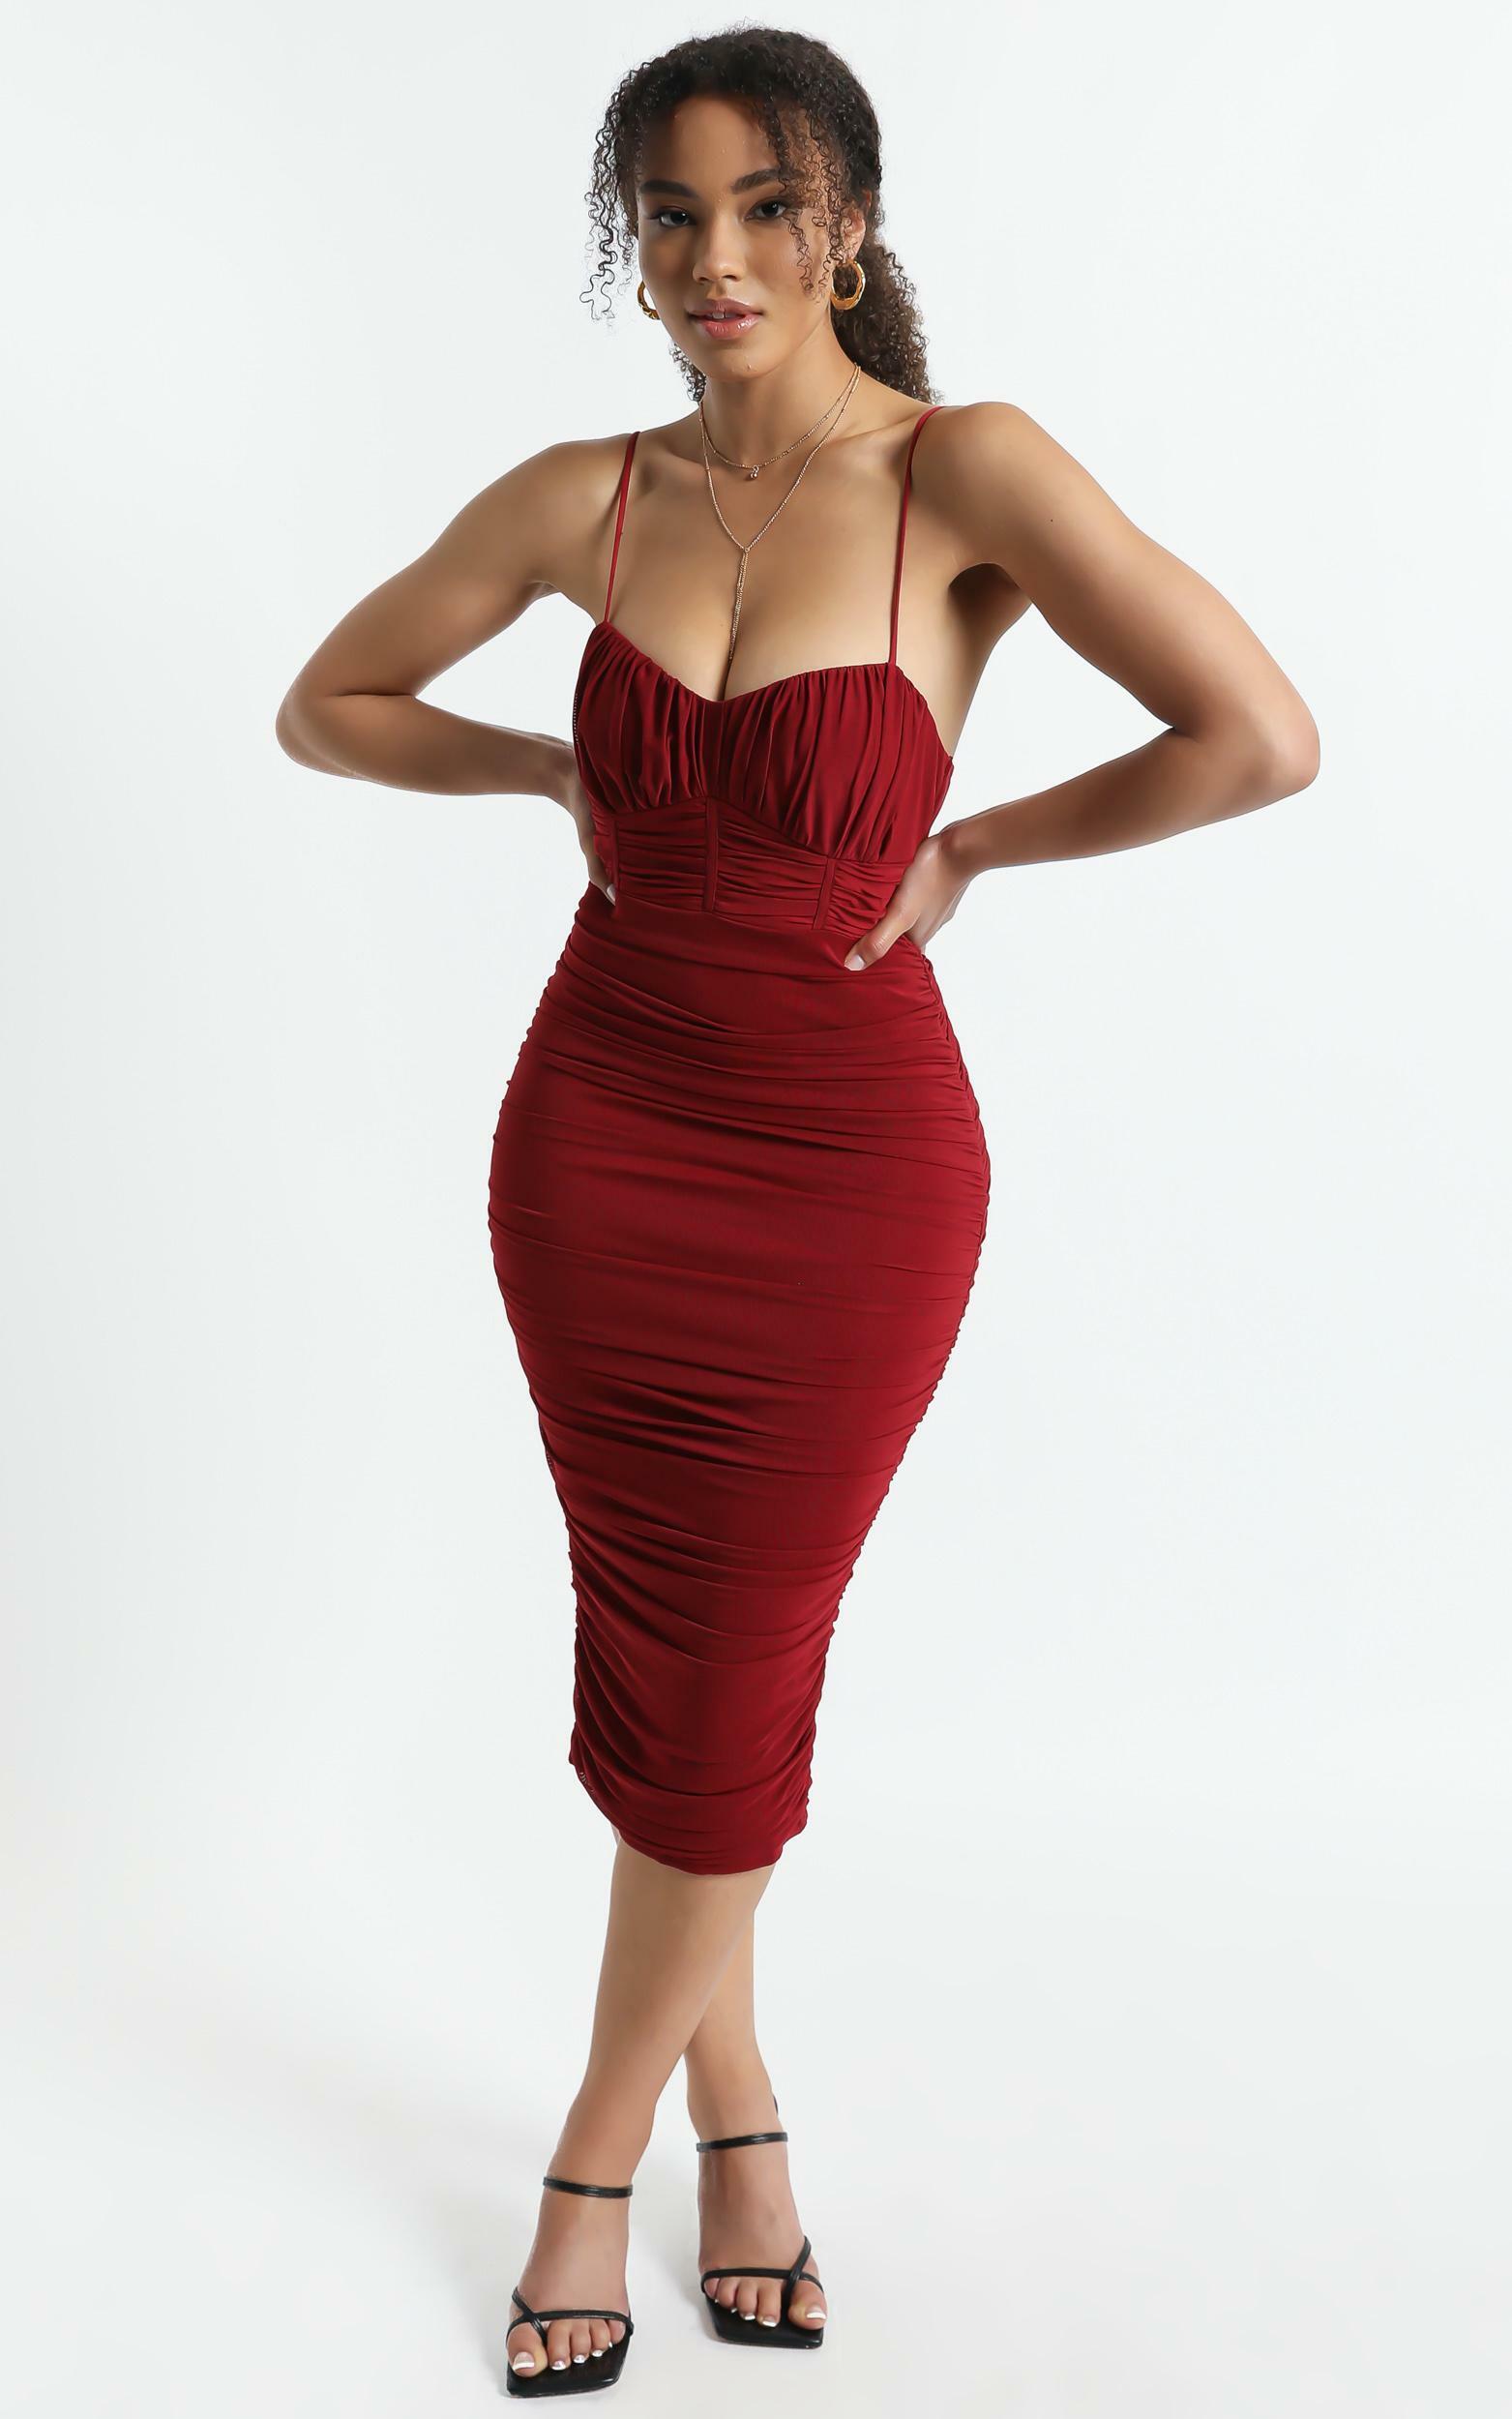 Periwinkle Dress In Wine - 16 (XXL), Wine, hi-res image number null